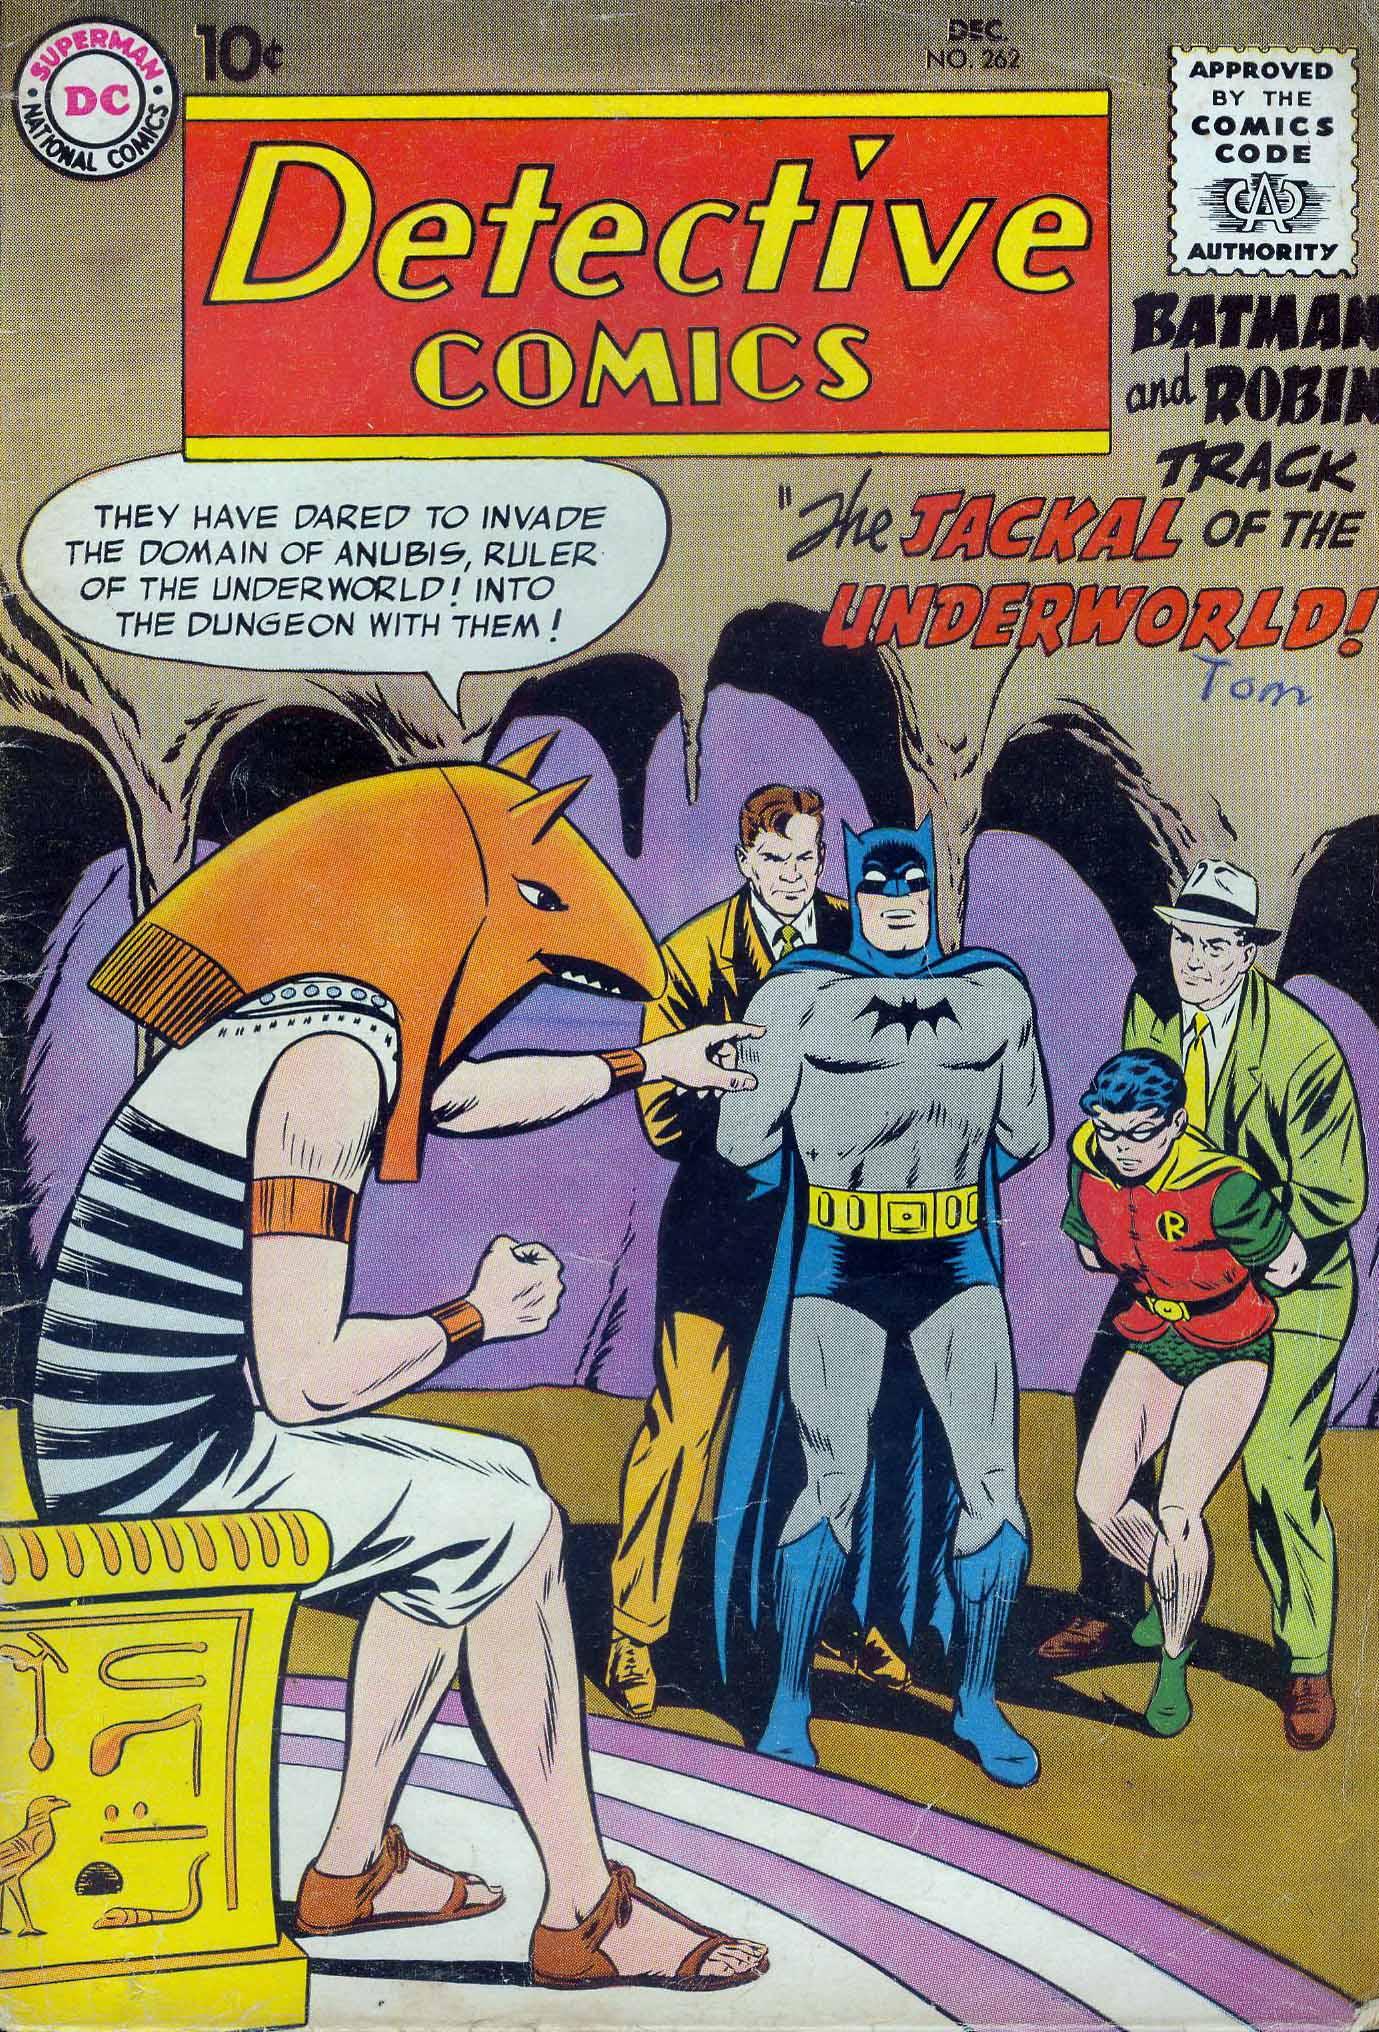 Read online Detective Comics (1937) comic -  Issue #262 - 1